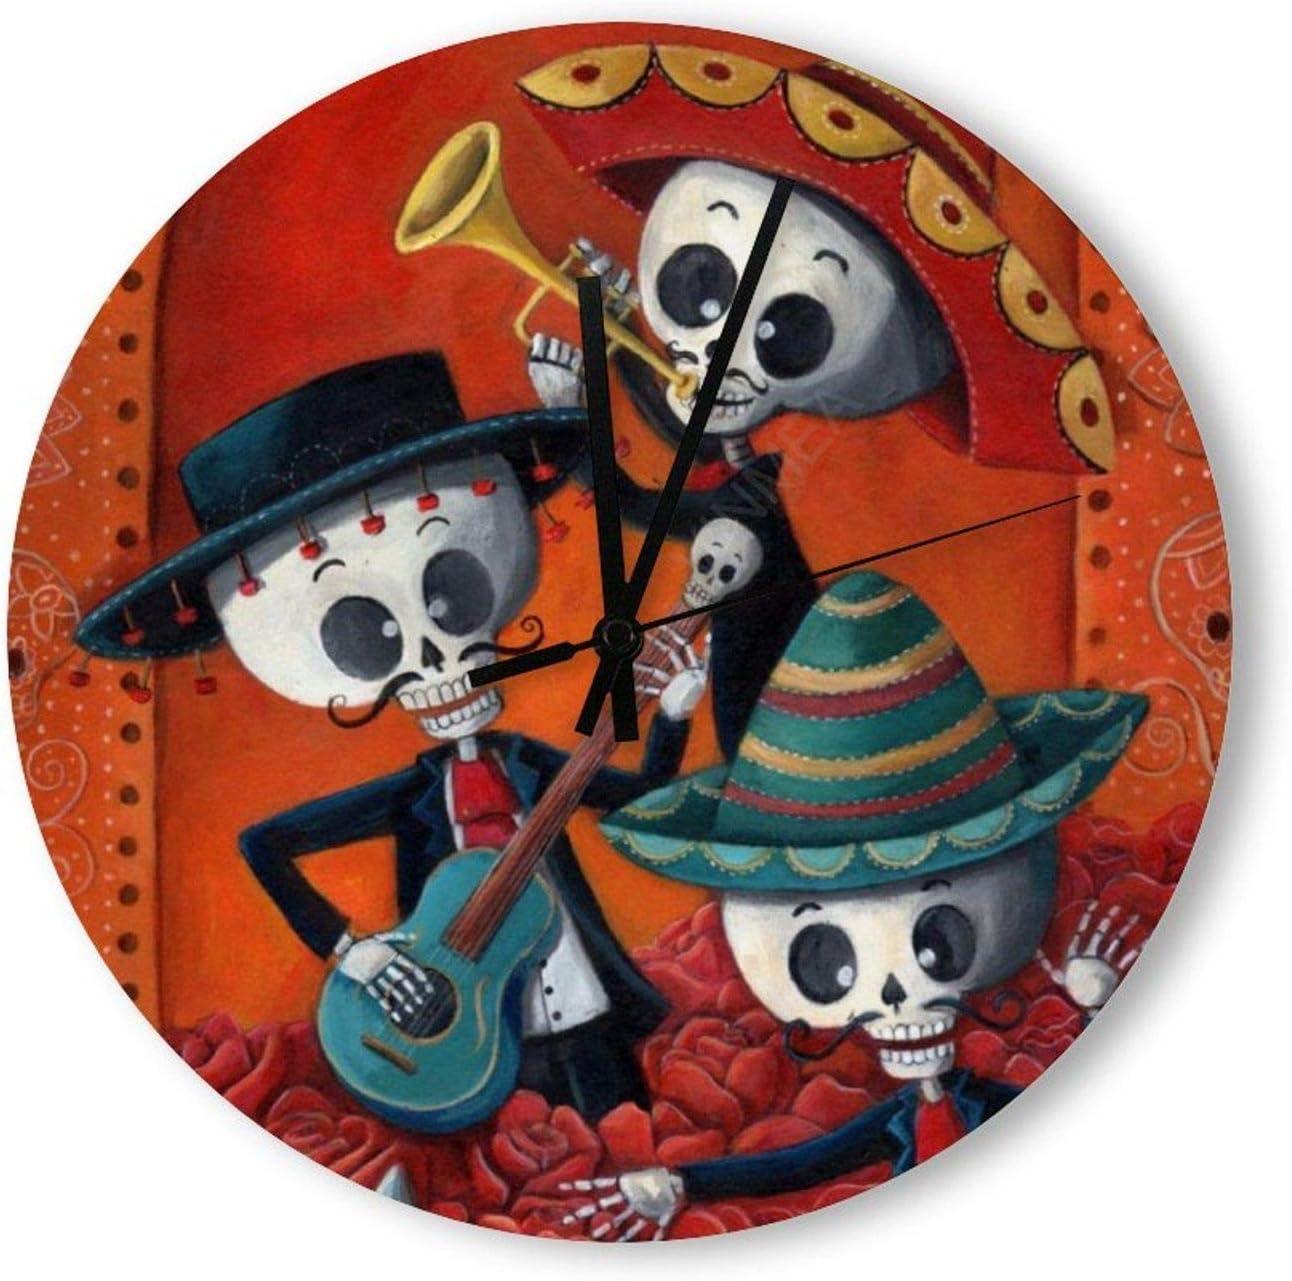 VinMea Decorative Wall Clock Silent Non Ticking Dia De Los Muertos Skeleton Mariachi Trio Home Decor Wall Clock Round 12 Inches